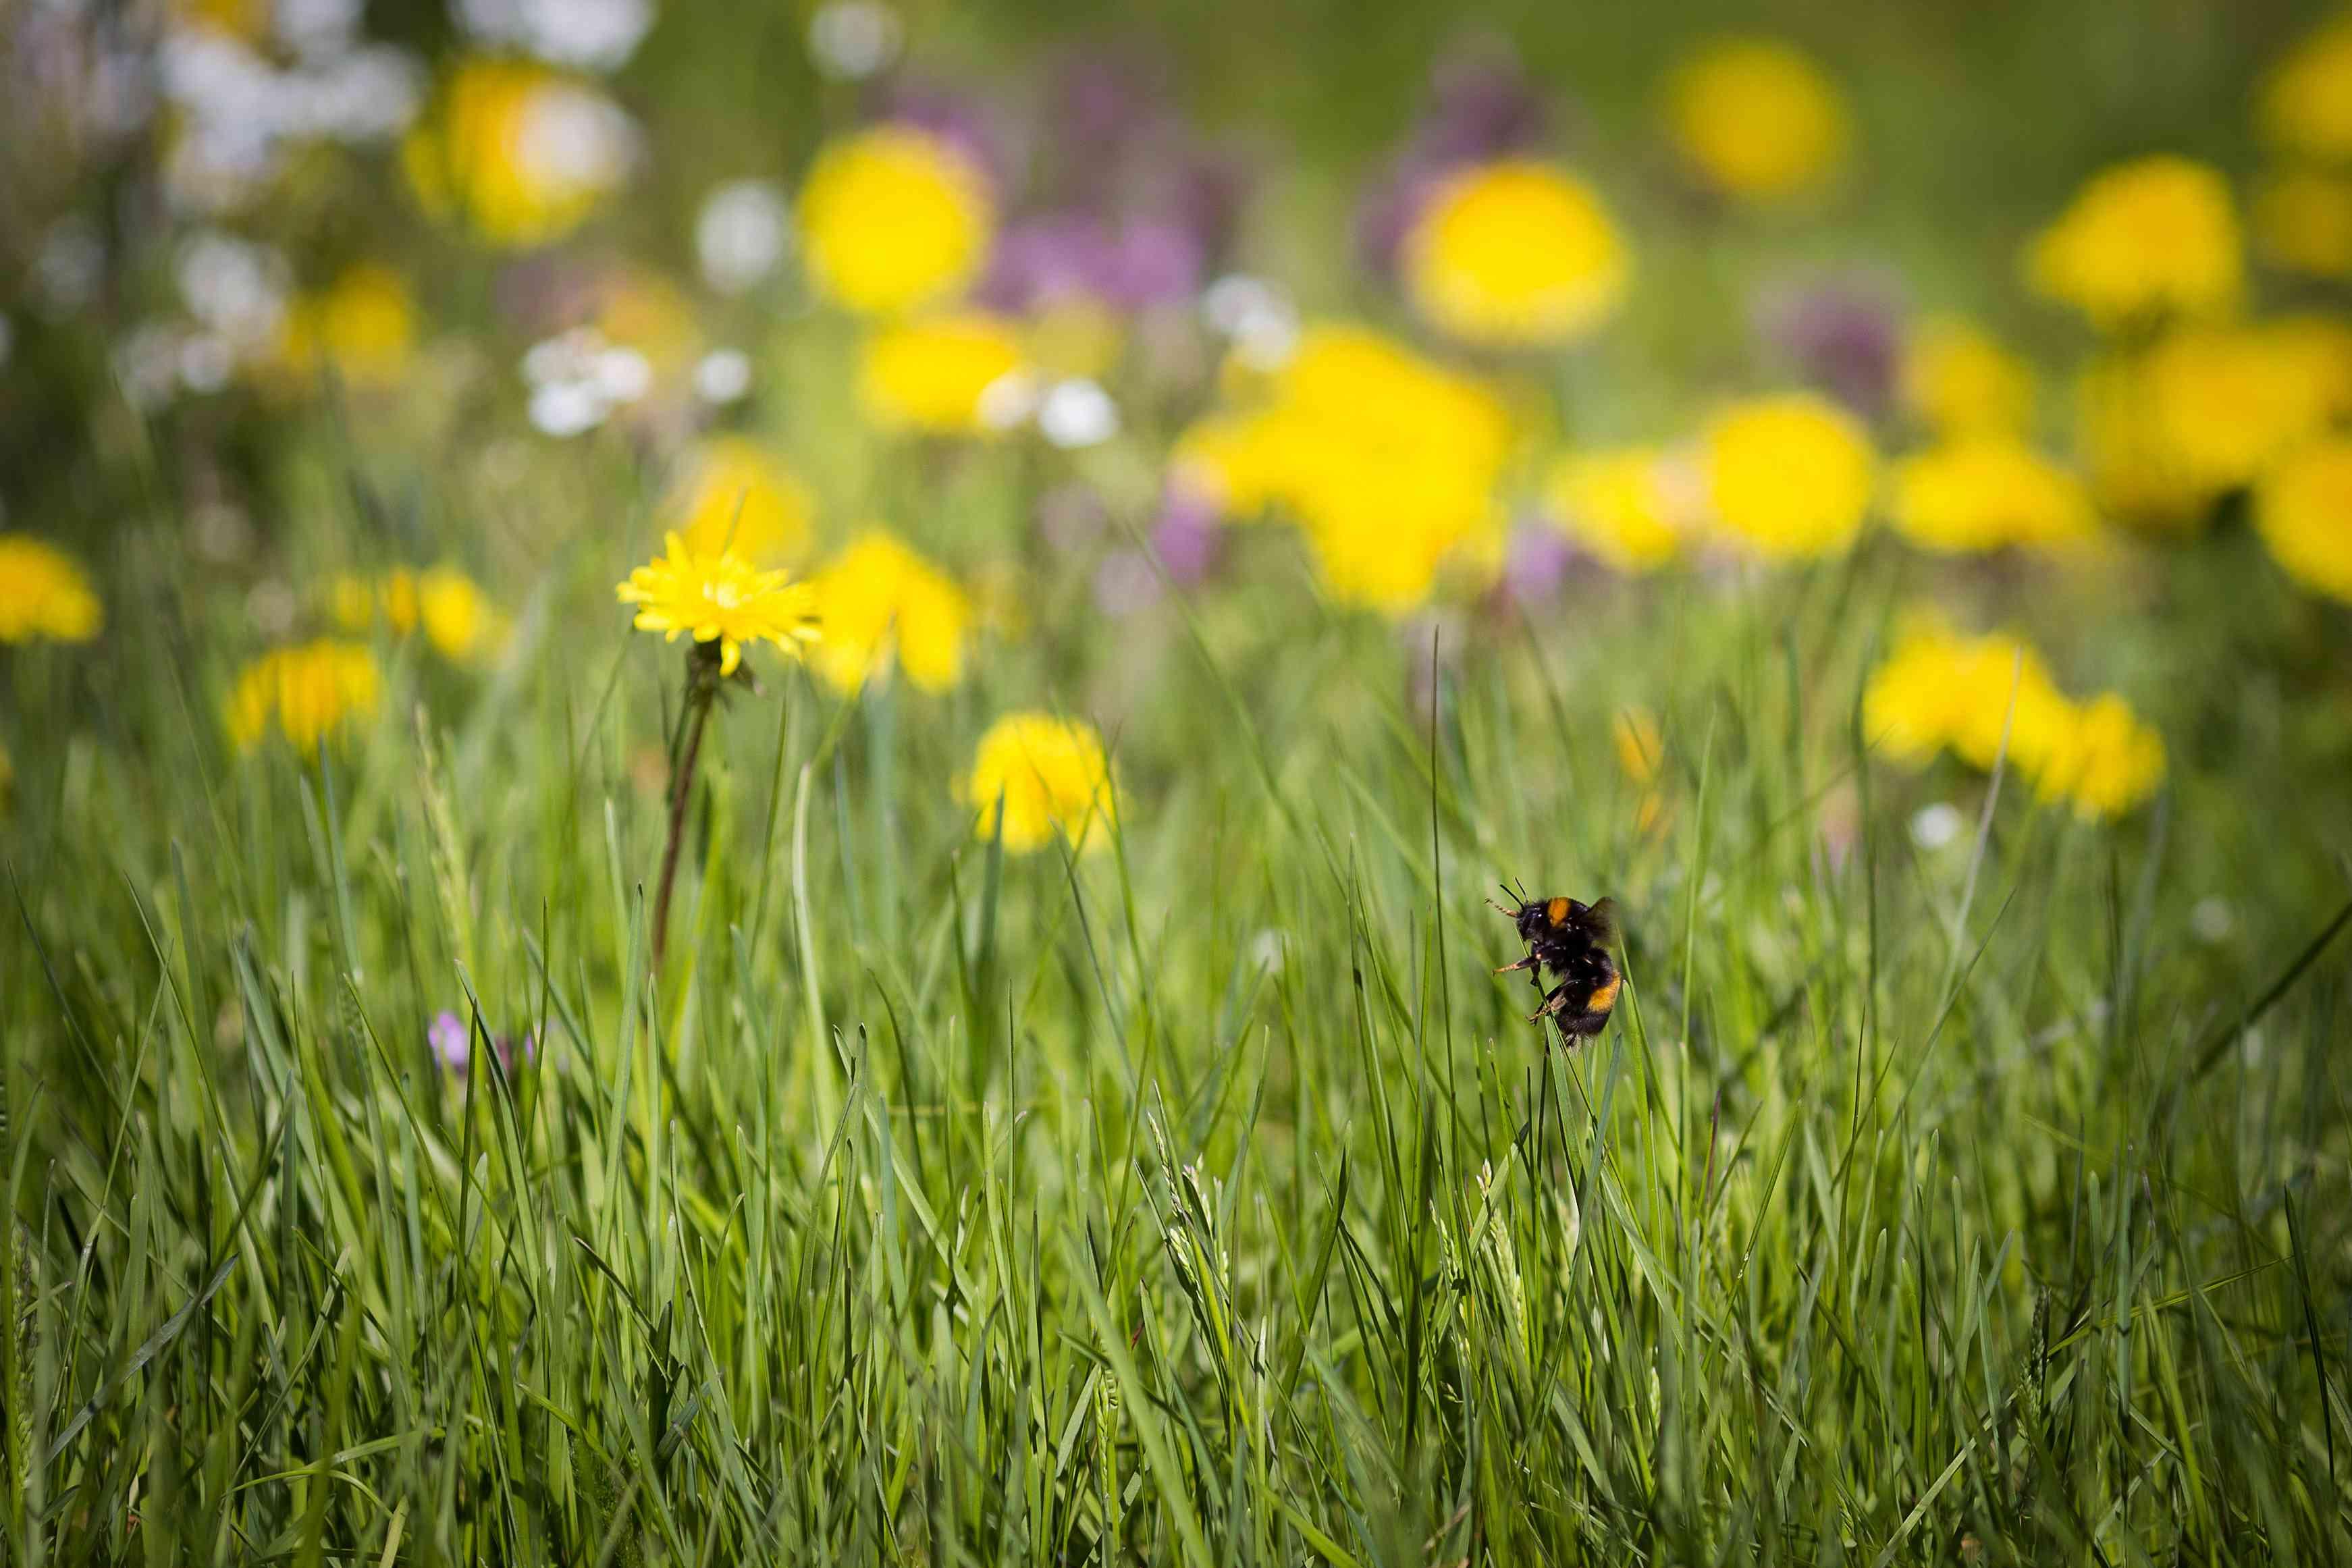 orange-belted bumblebee and dandelions